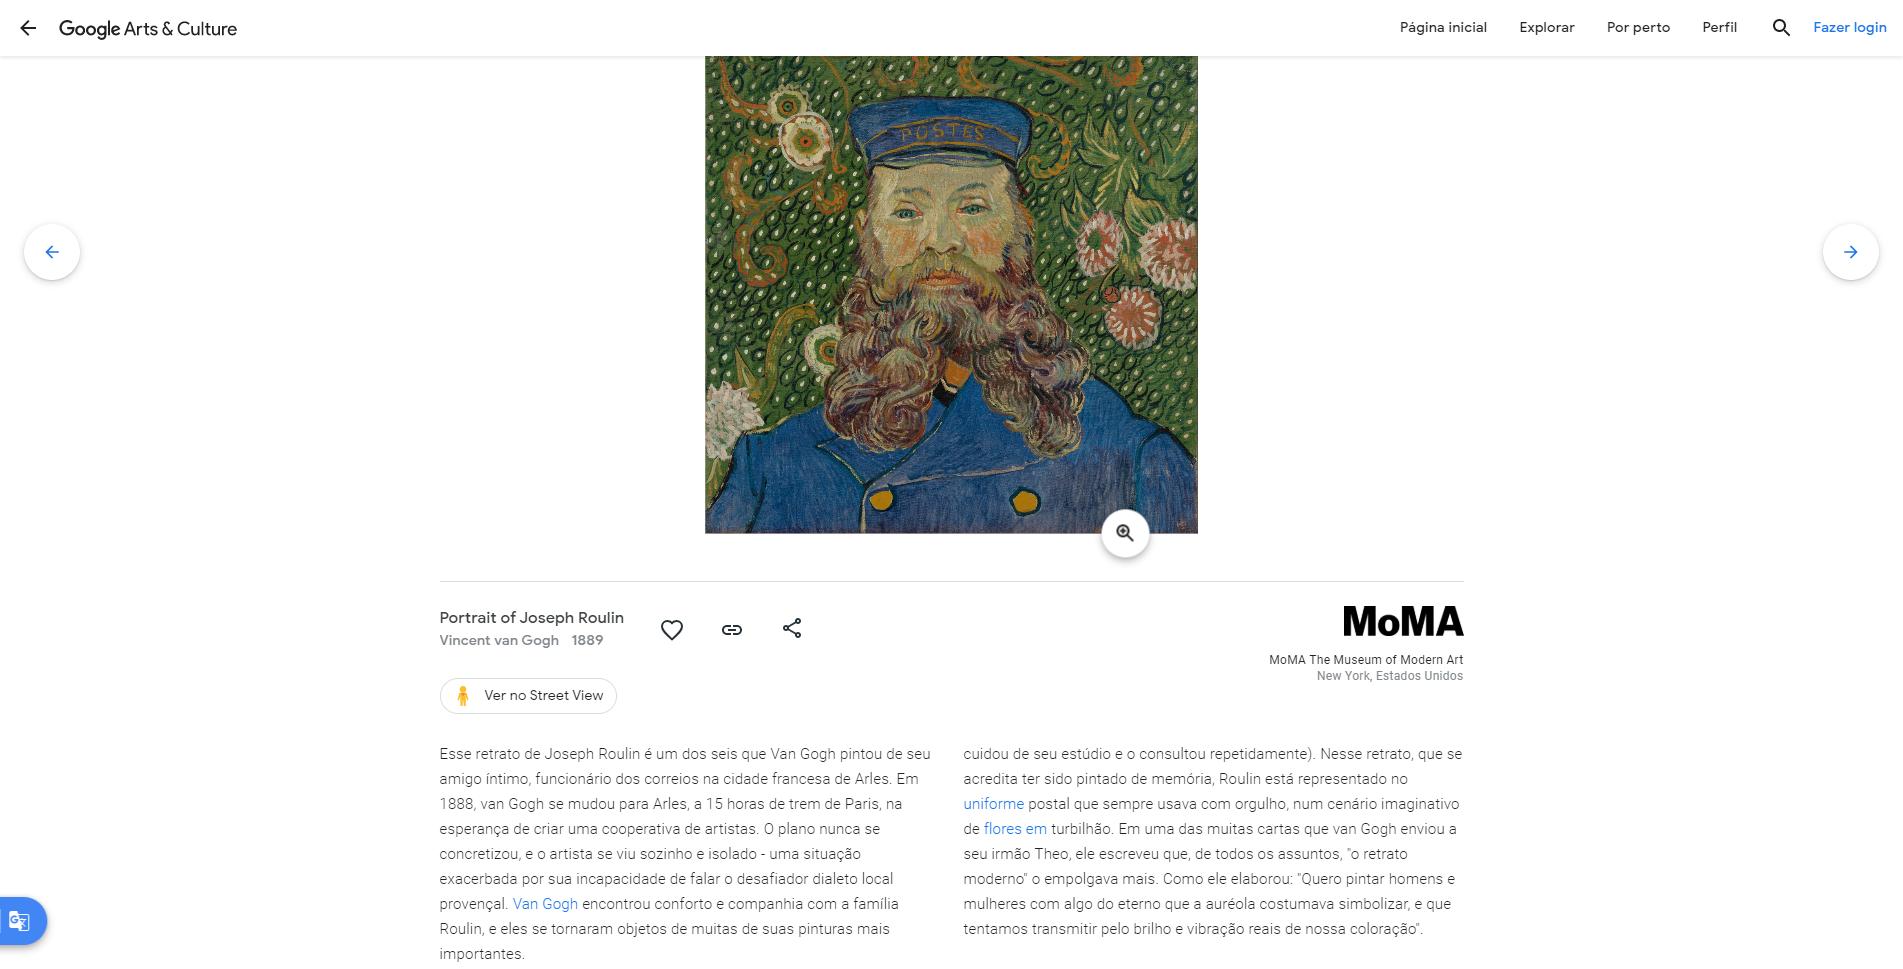 retrato de joseph roulin van gogh 1889 museu de arte moderna de nova york moma virtual google designe